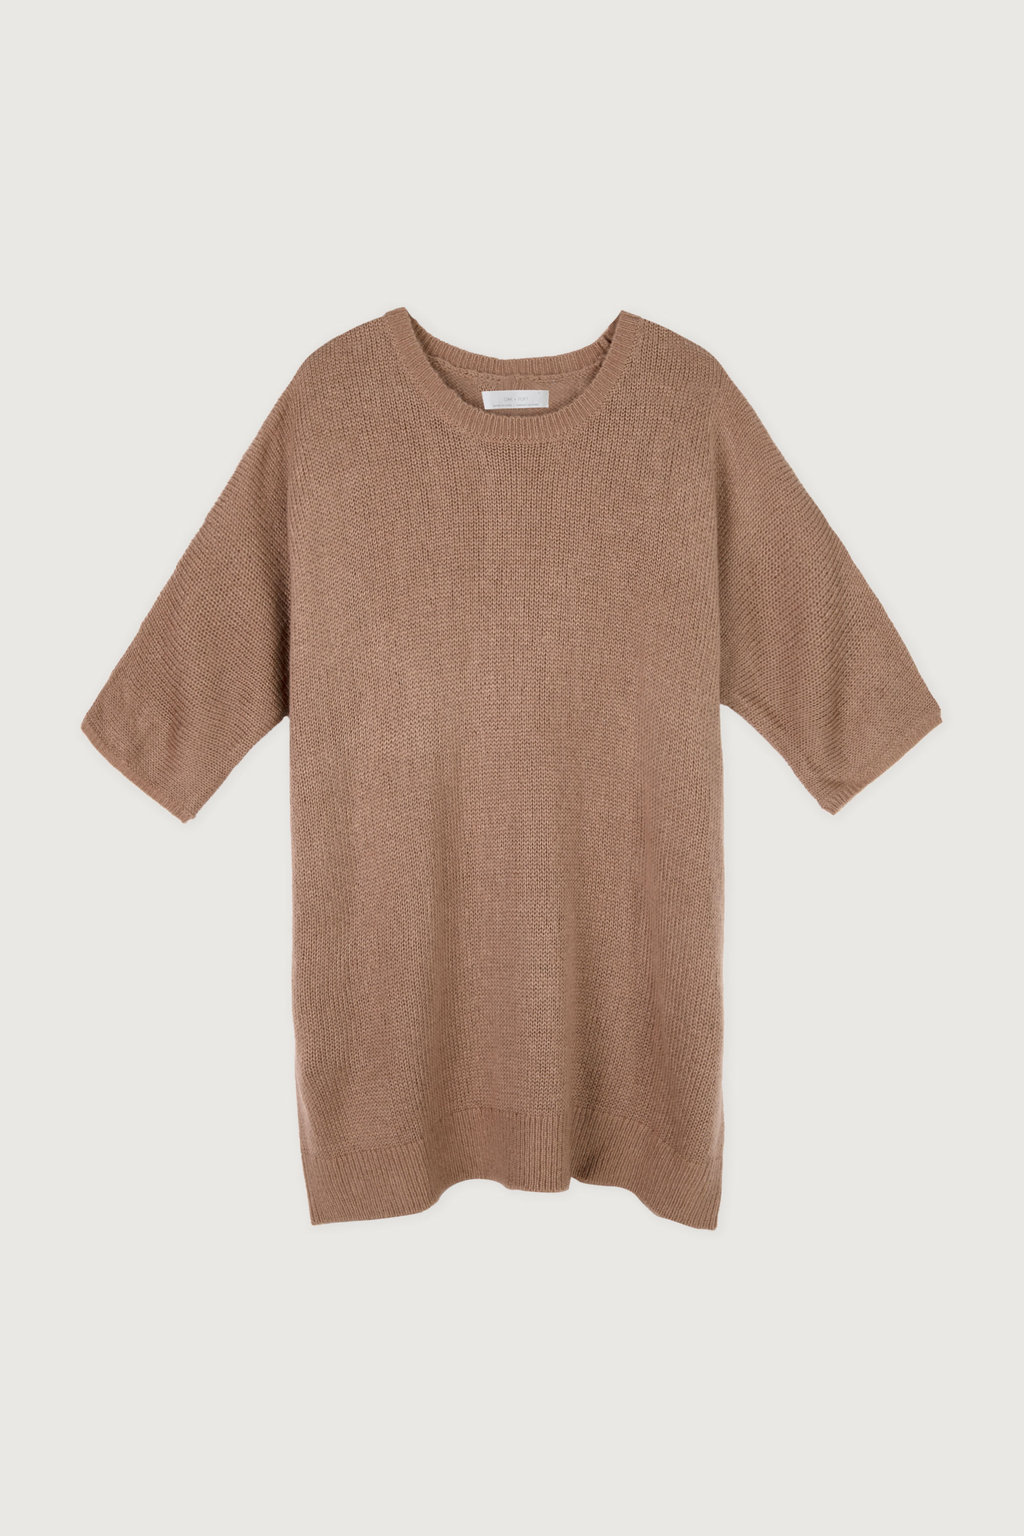 Sweater 3677 Terracotta 7